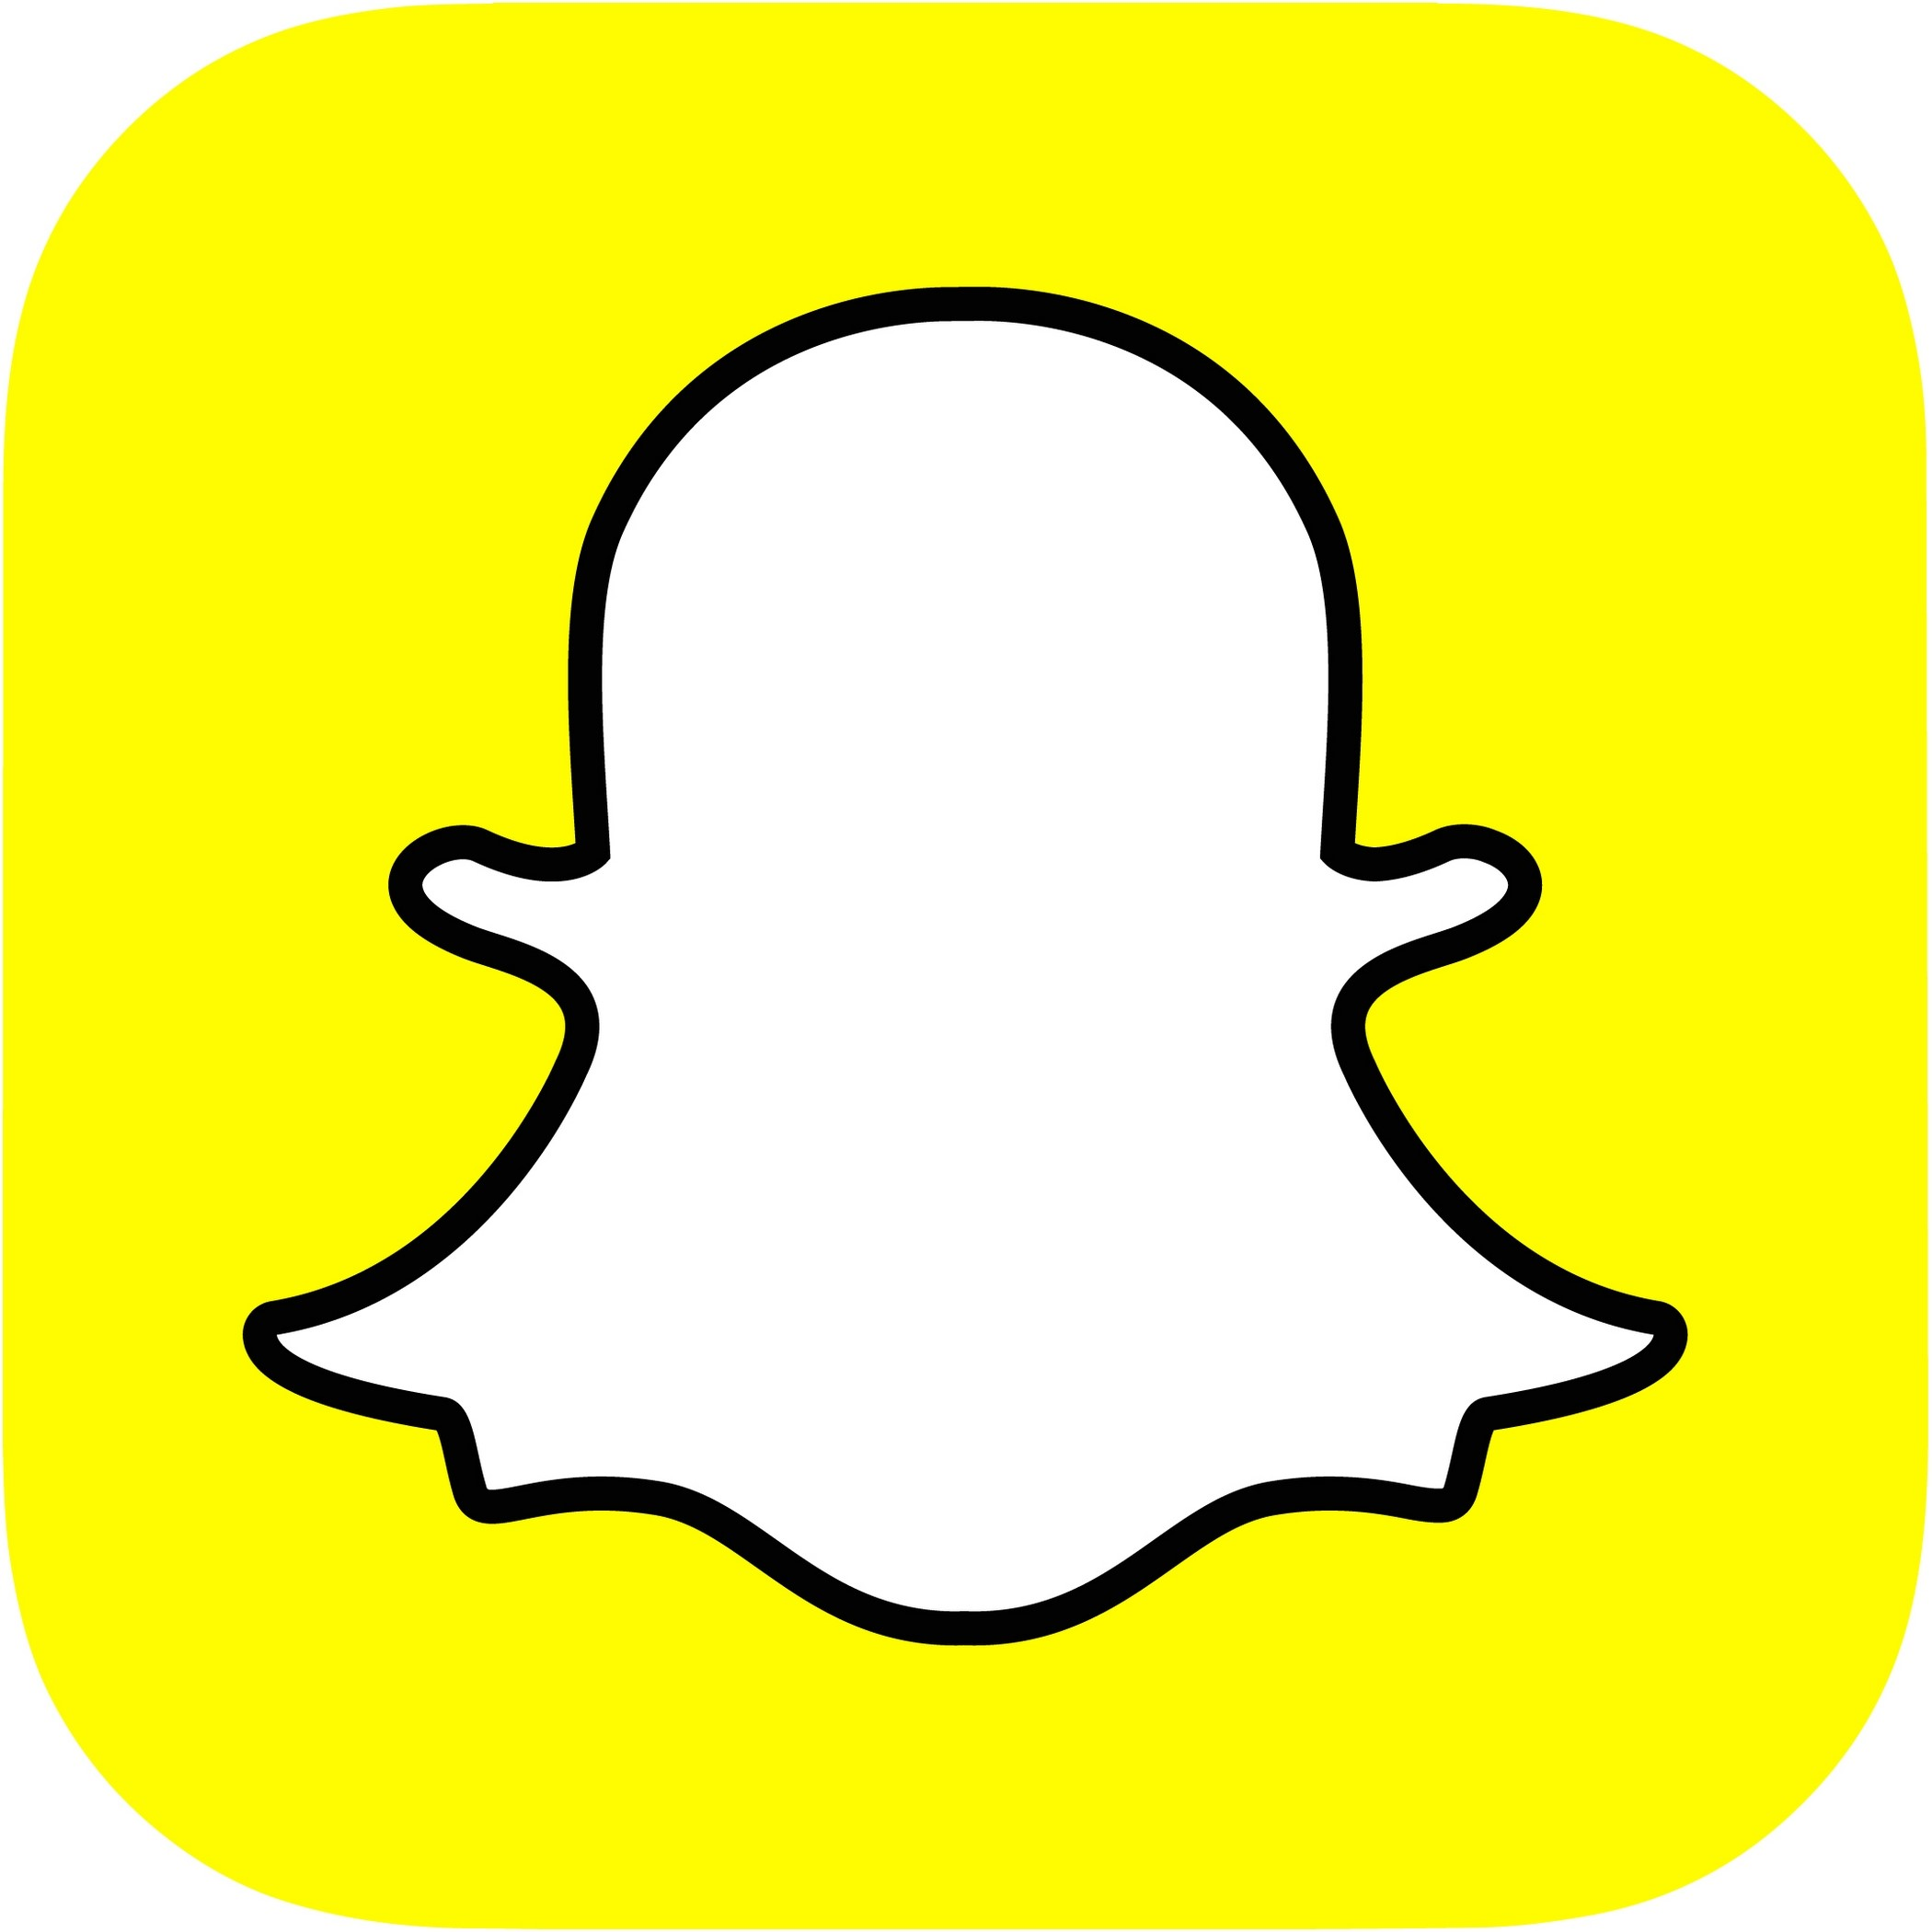 2100x2100 Instagram Clipart Png Transparent Background